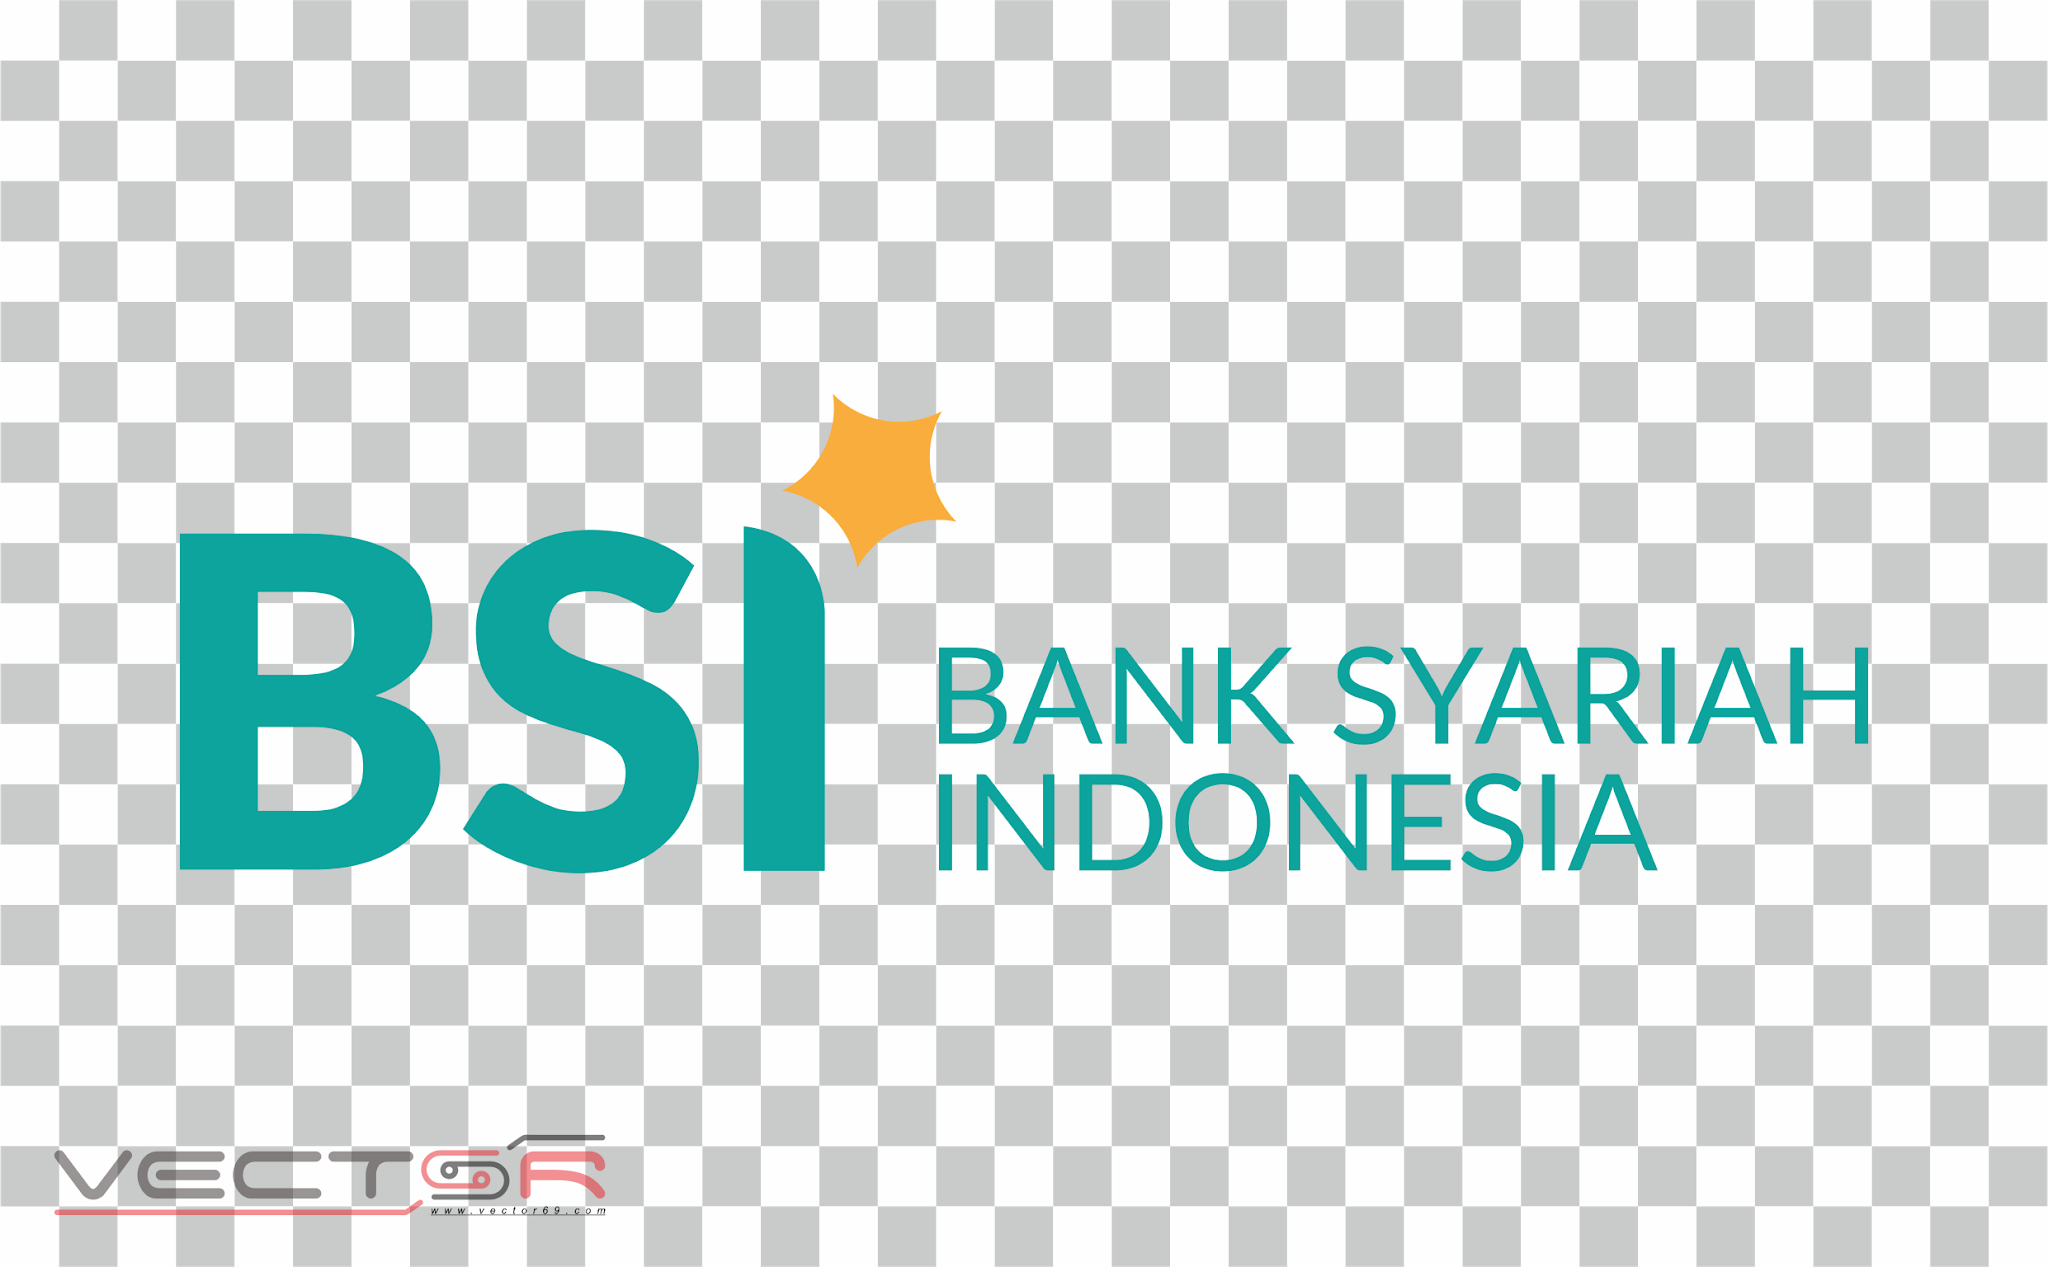 BSI (Bank Syariah Indonesia) Logo - Download Vector File PNG (Portable Network Graphics)